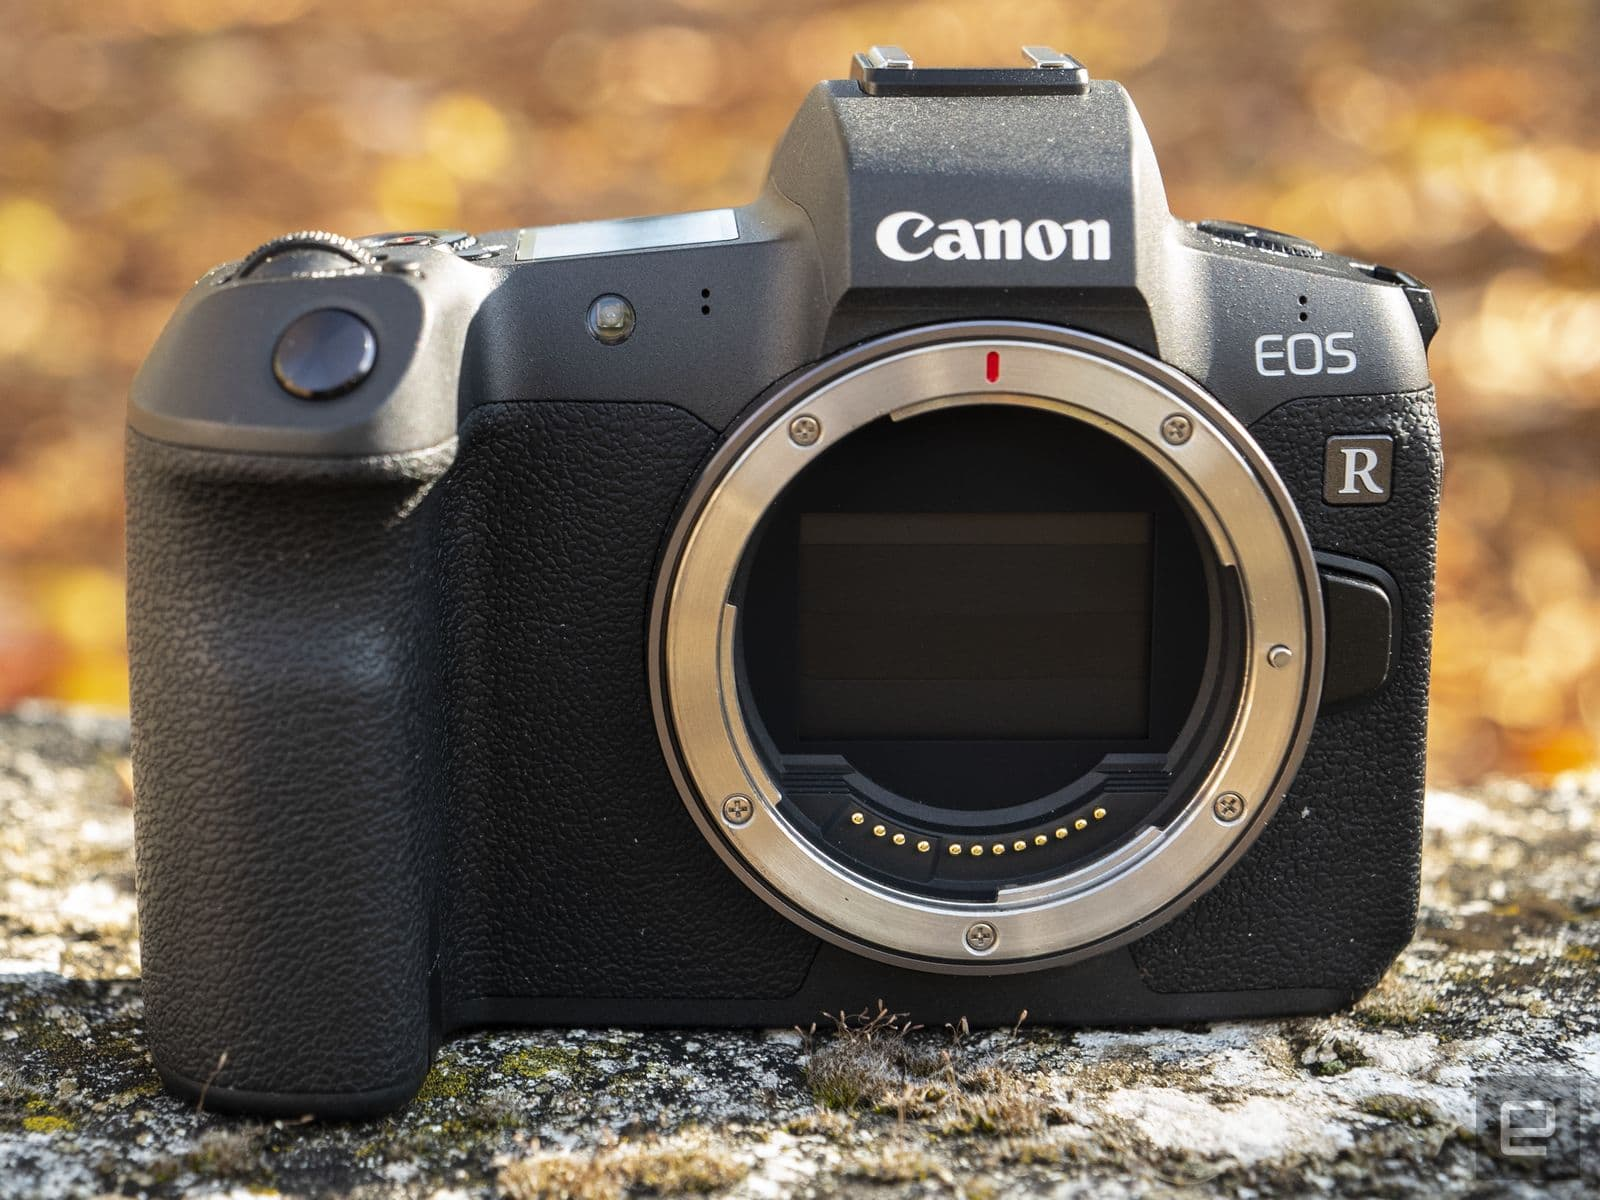 Canon EOS R mirrorless full-frame camera